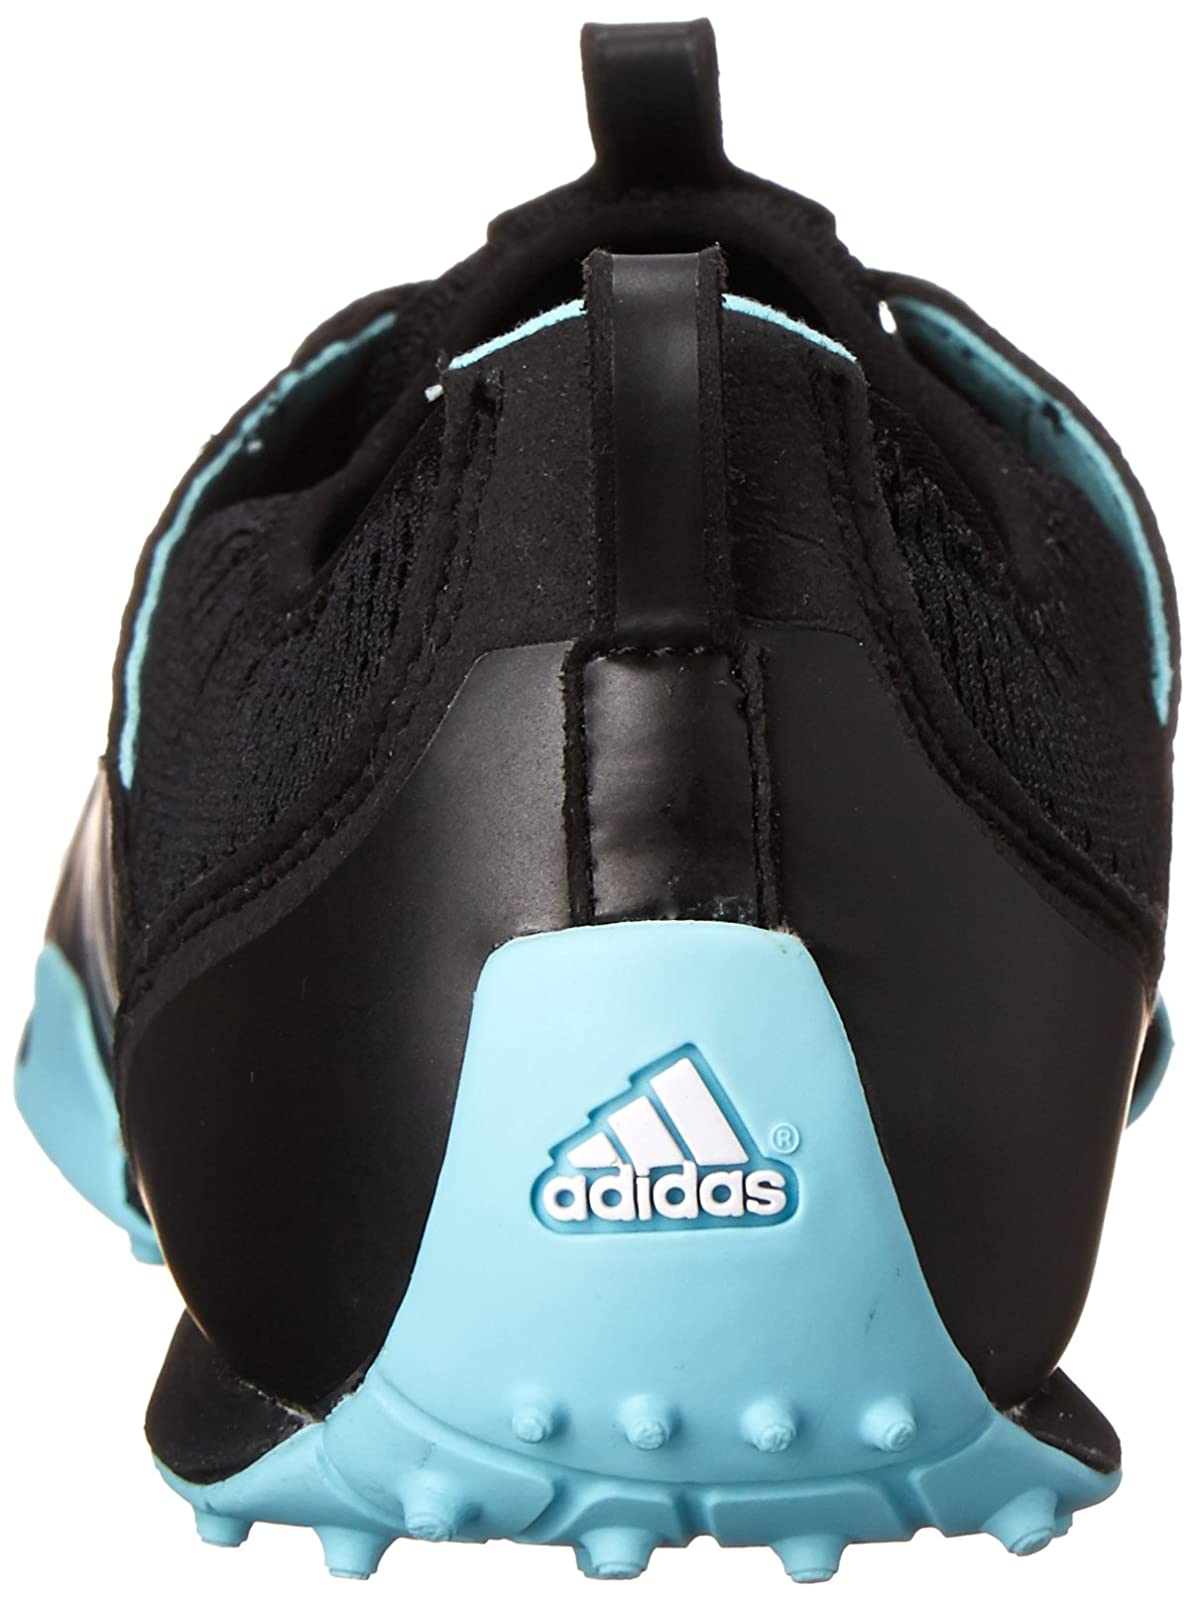 adidas Women's W CC Ballerina II Golf Shoe 13 M US - 2